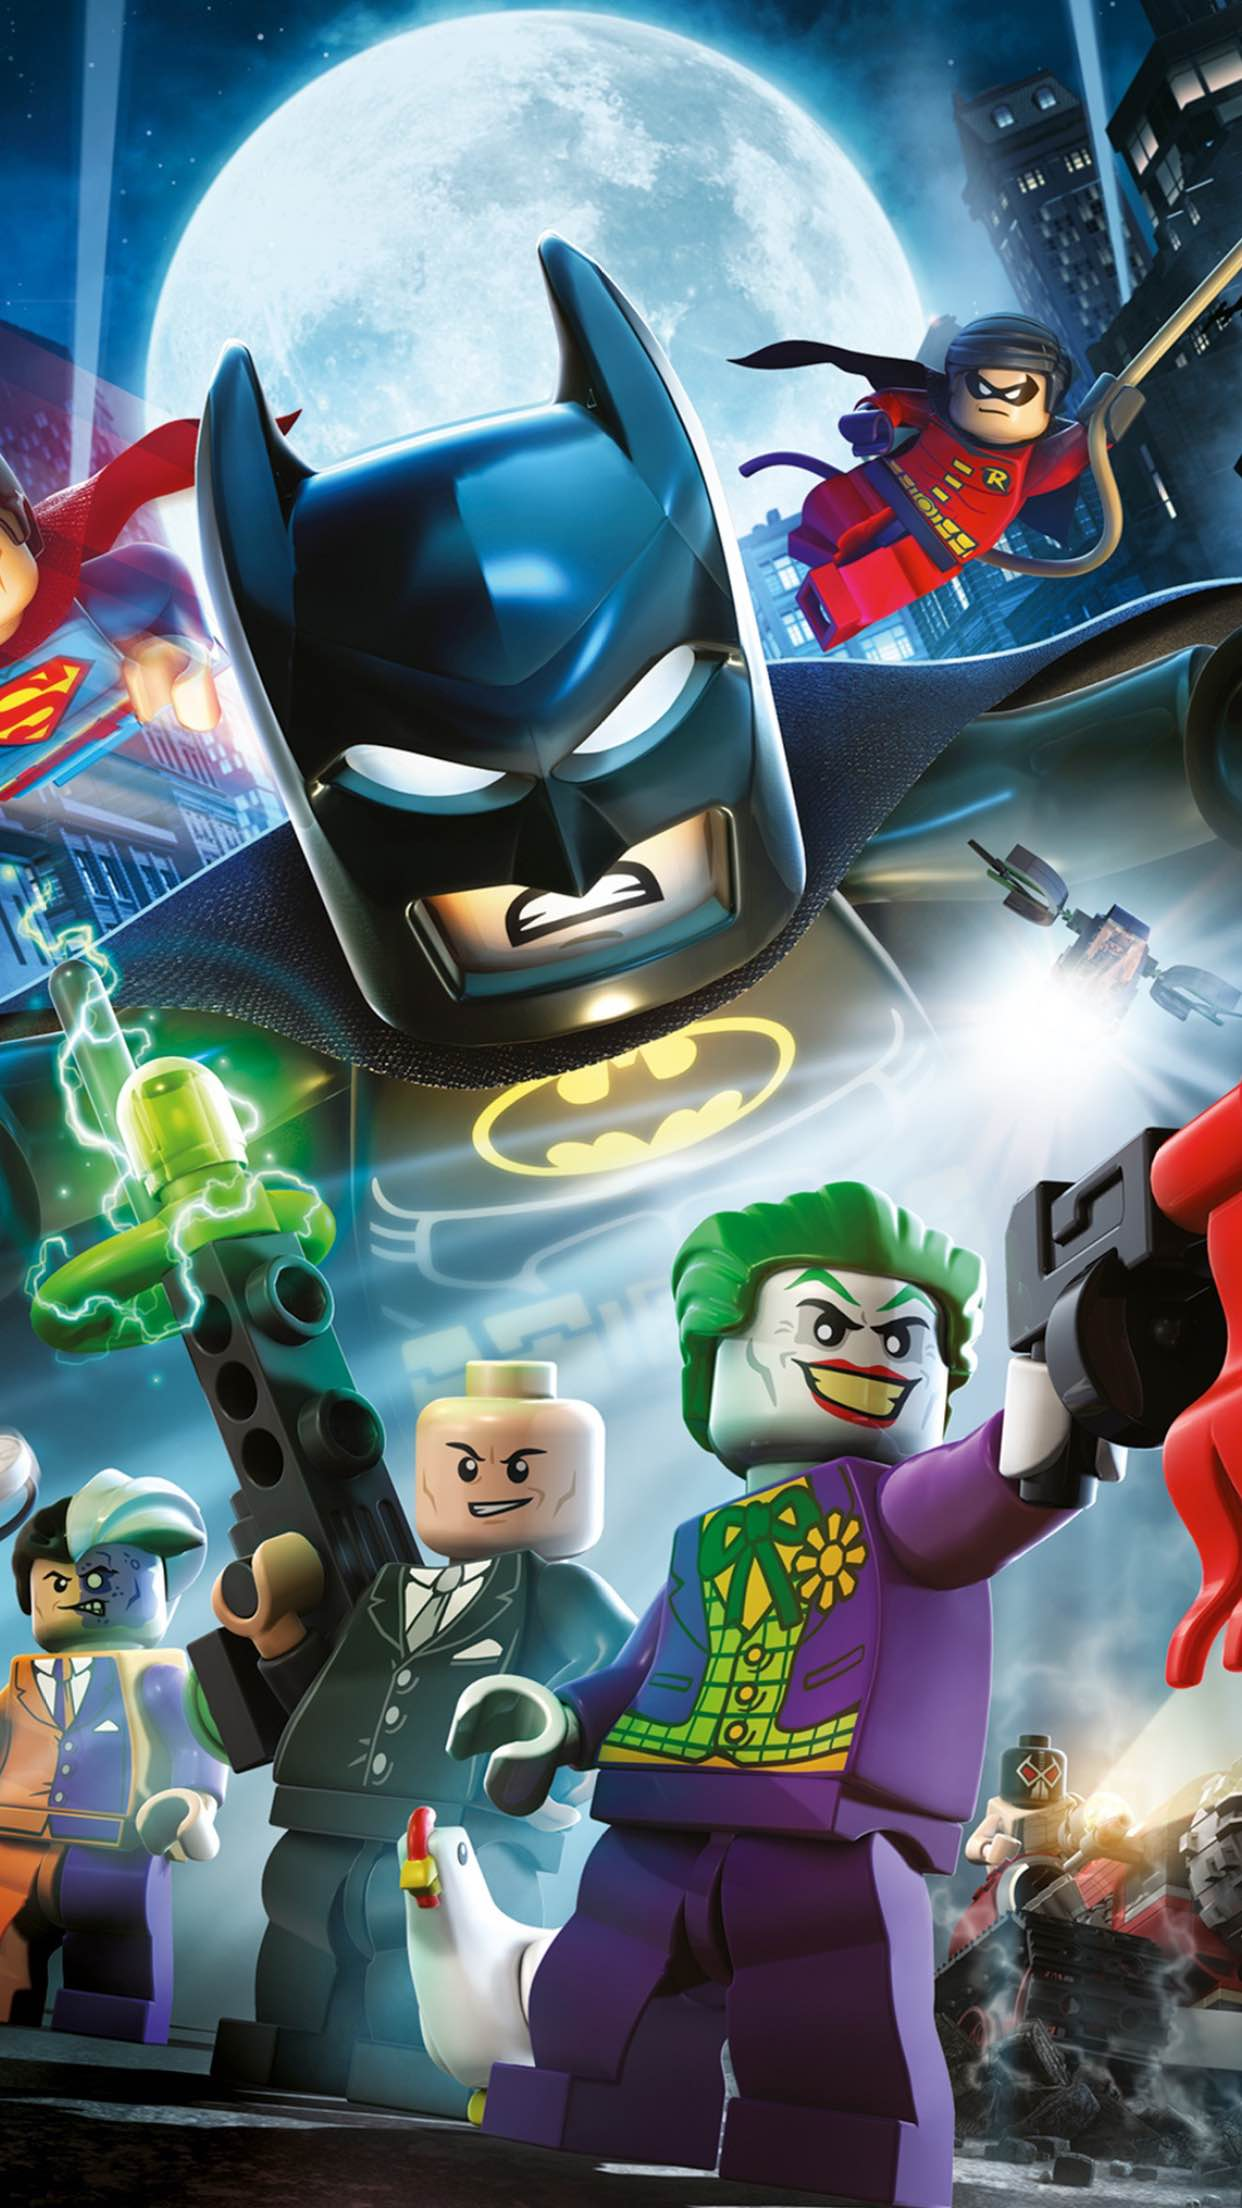 Lego Batman Wallpaper For Iphone X 8 7 6 Free Download